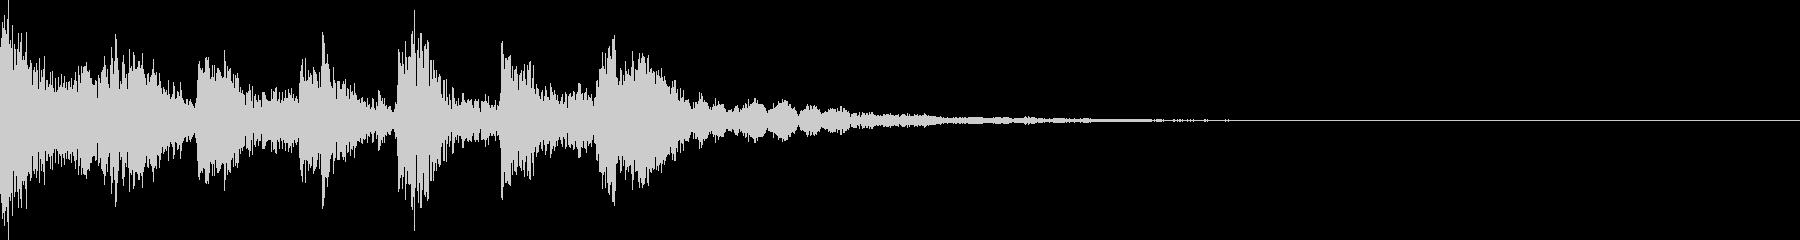 A short jingle 1 by Pizzicato's unreproduced waveform